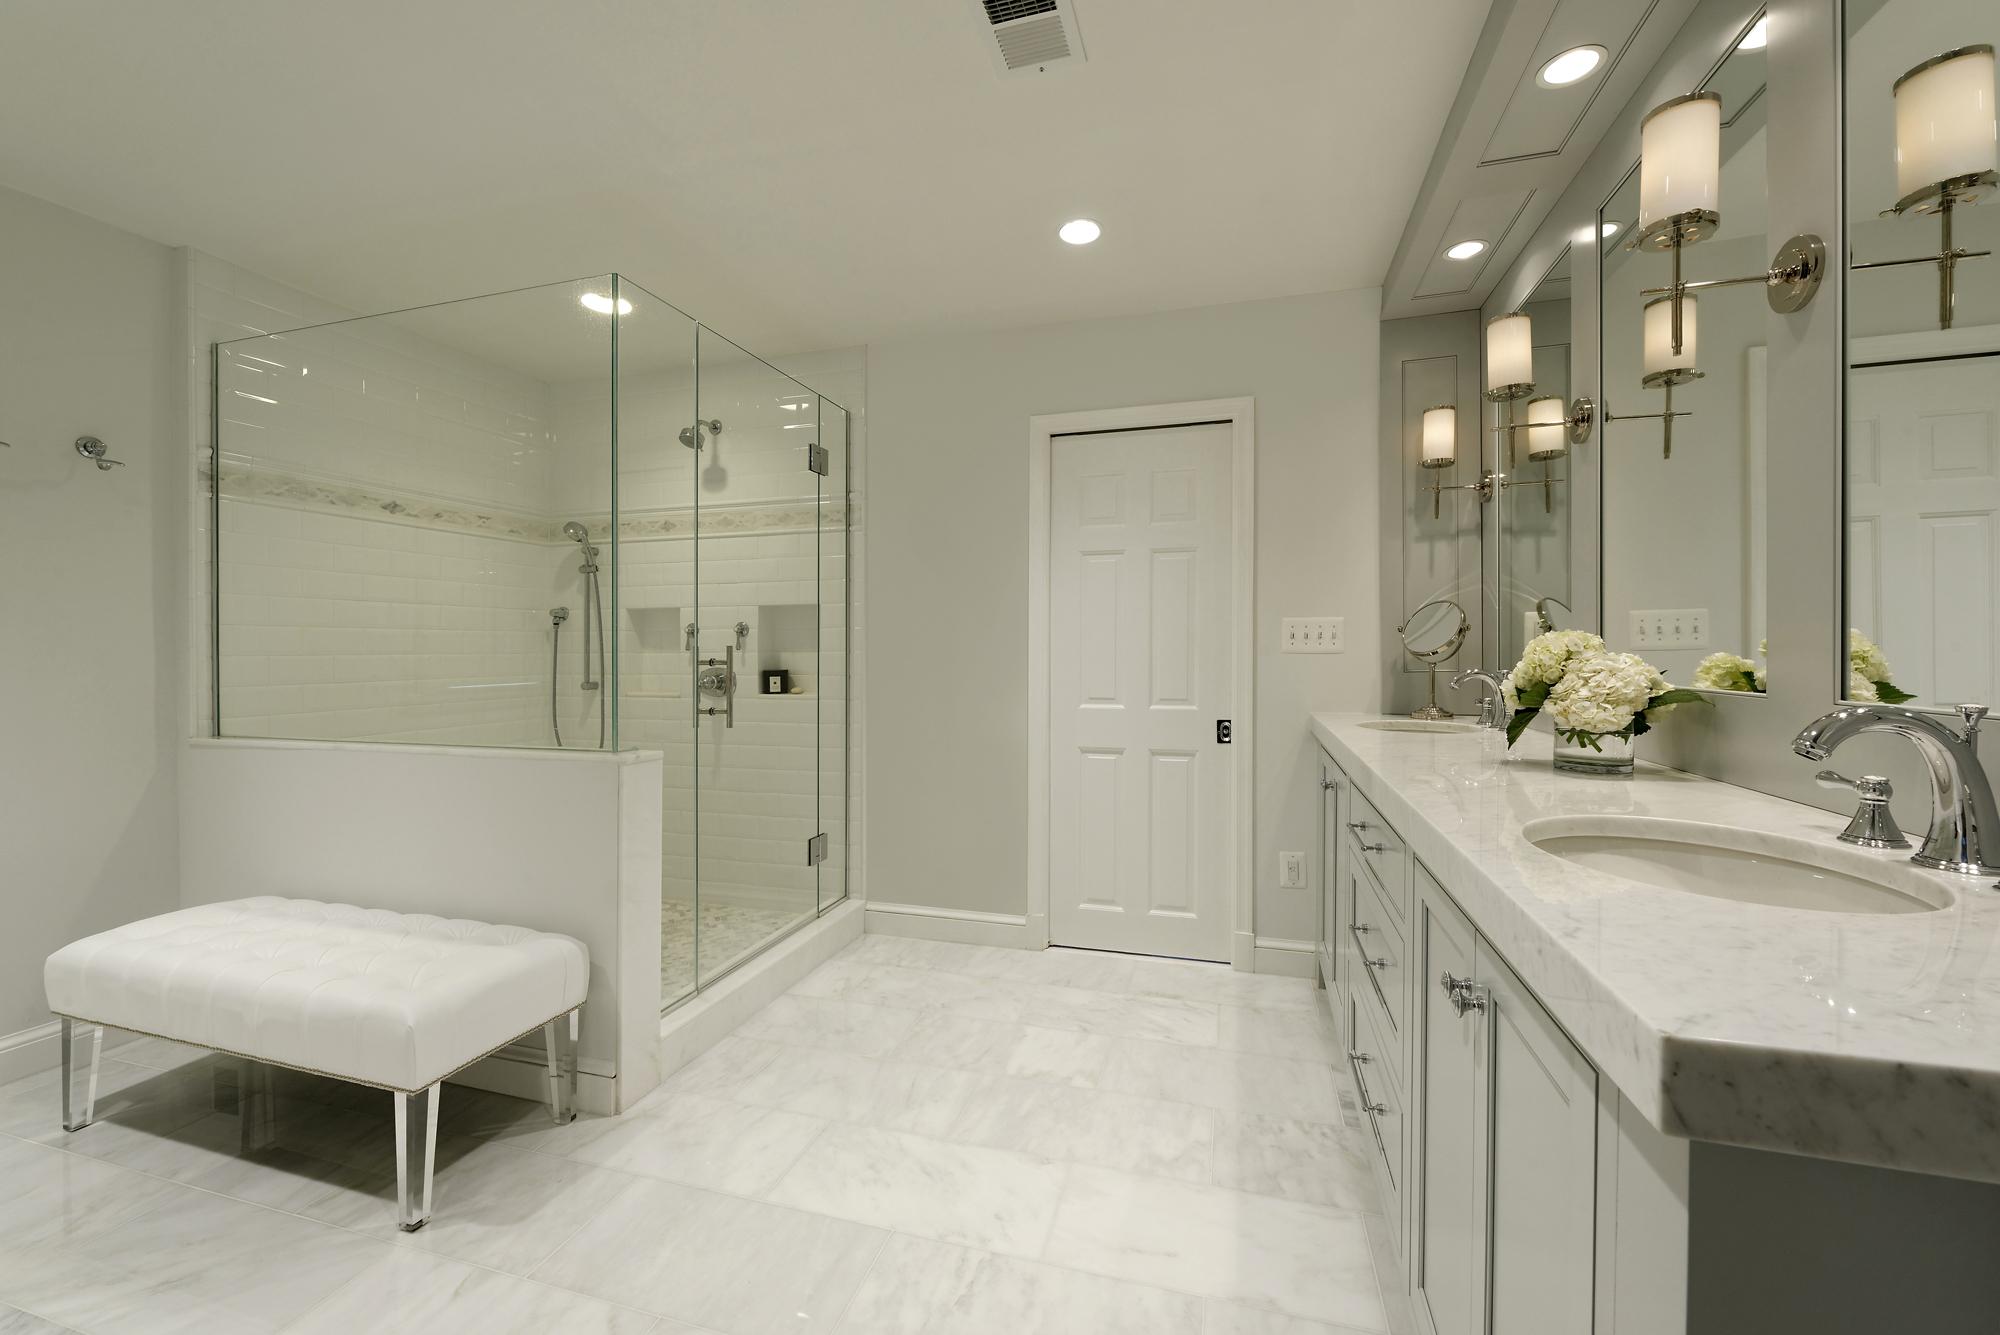 office bethesda md traditional master bathroom - Bathroom Remodeling Bethesda Md